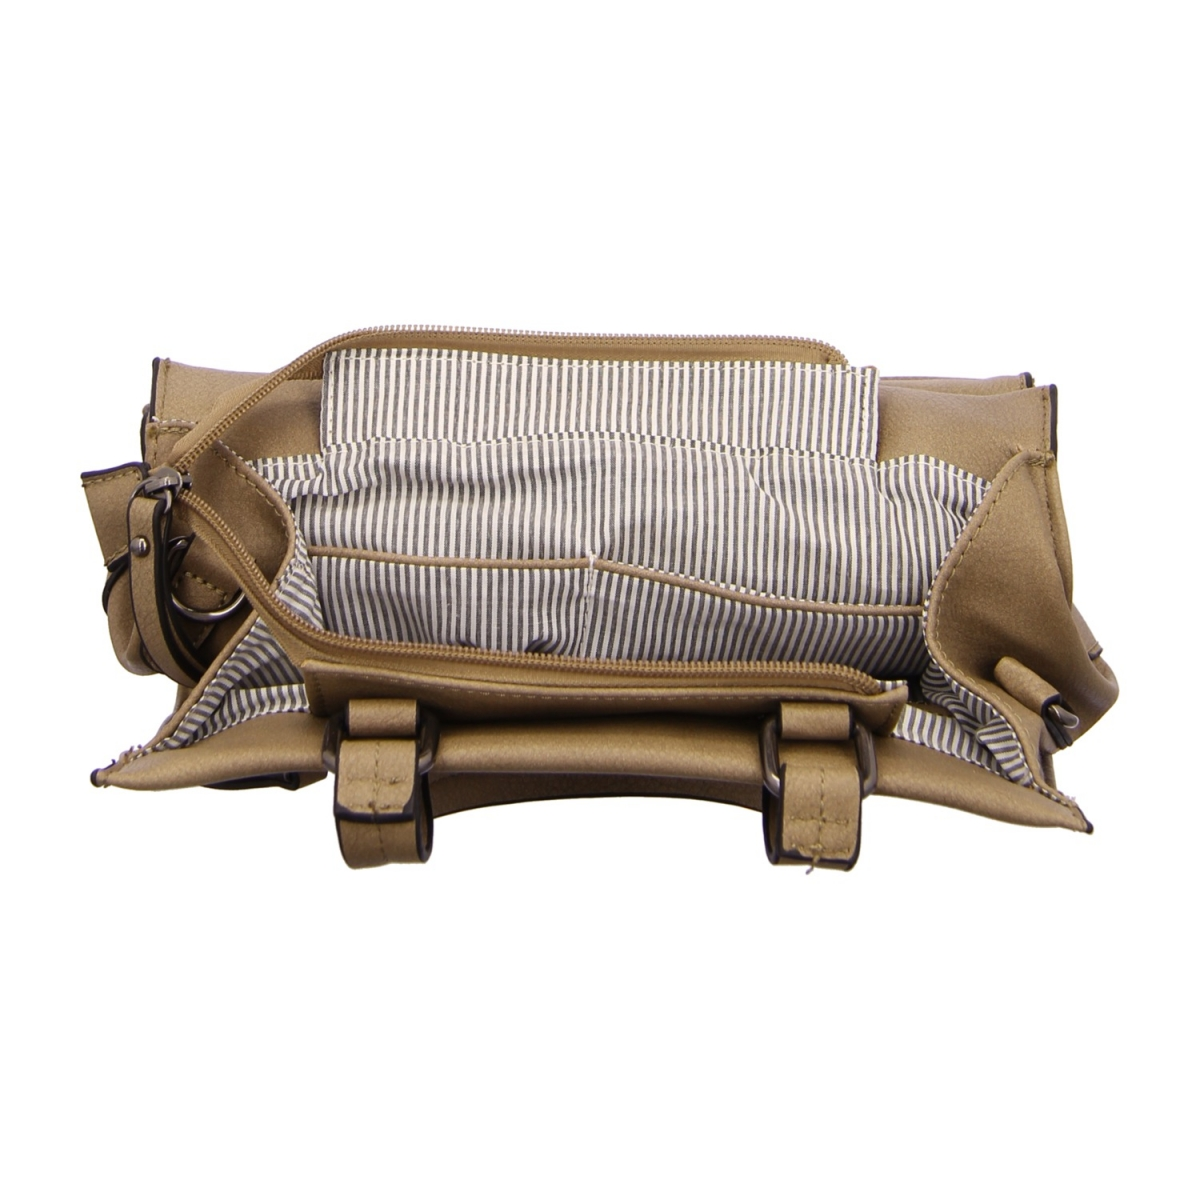 emily noah handtasche beige sale schuhfachmann. Black Bedroom Furniture Sets. Home Design Ideas